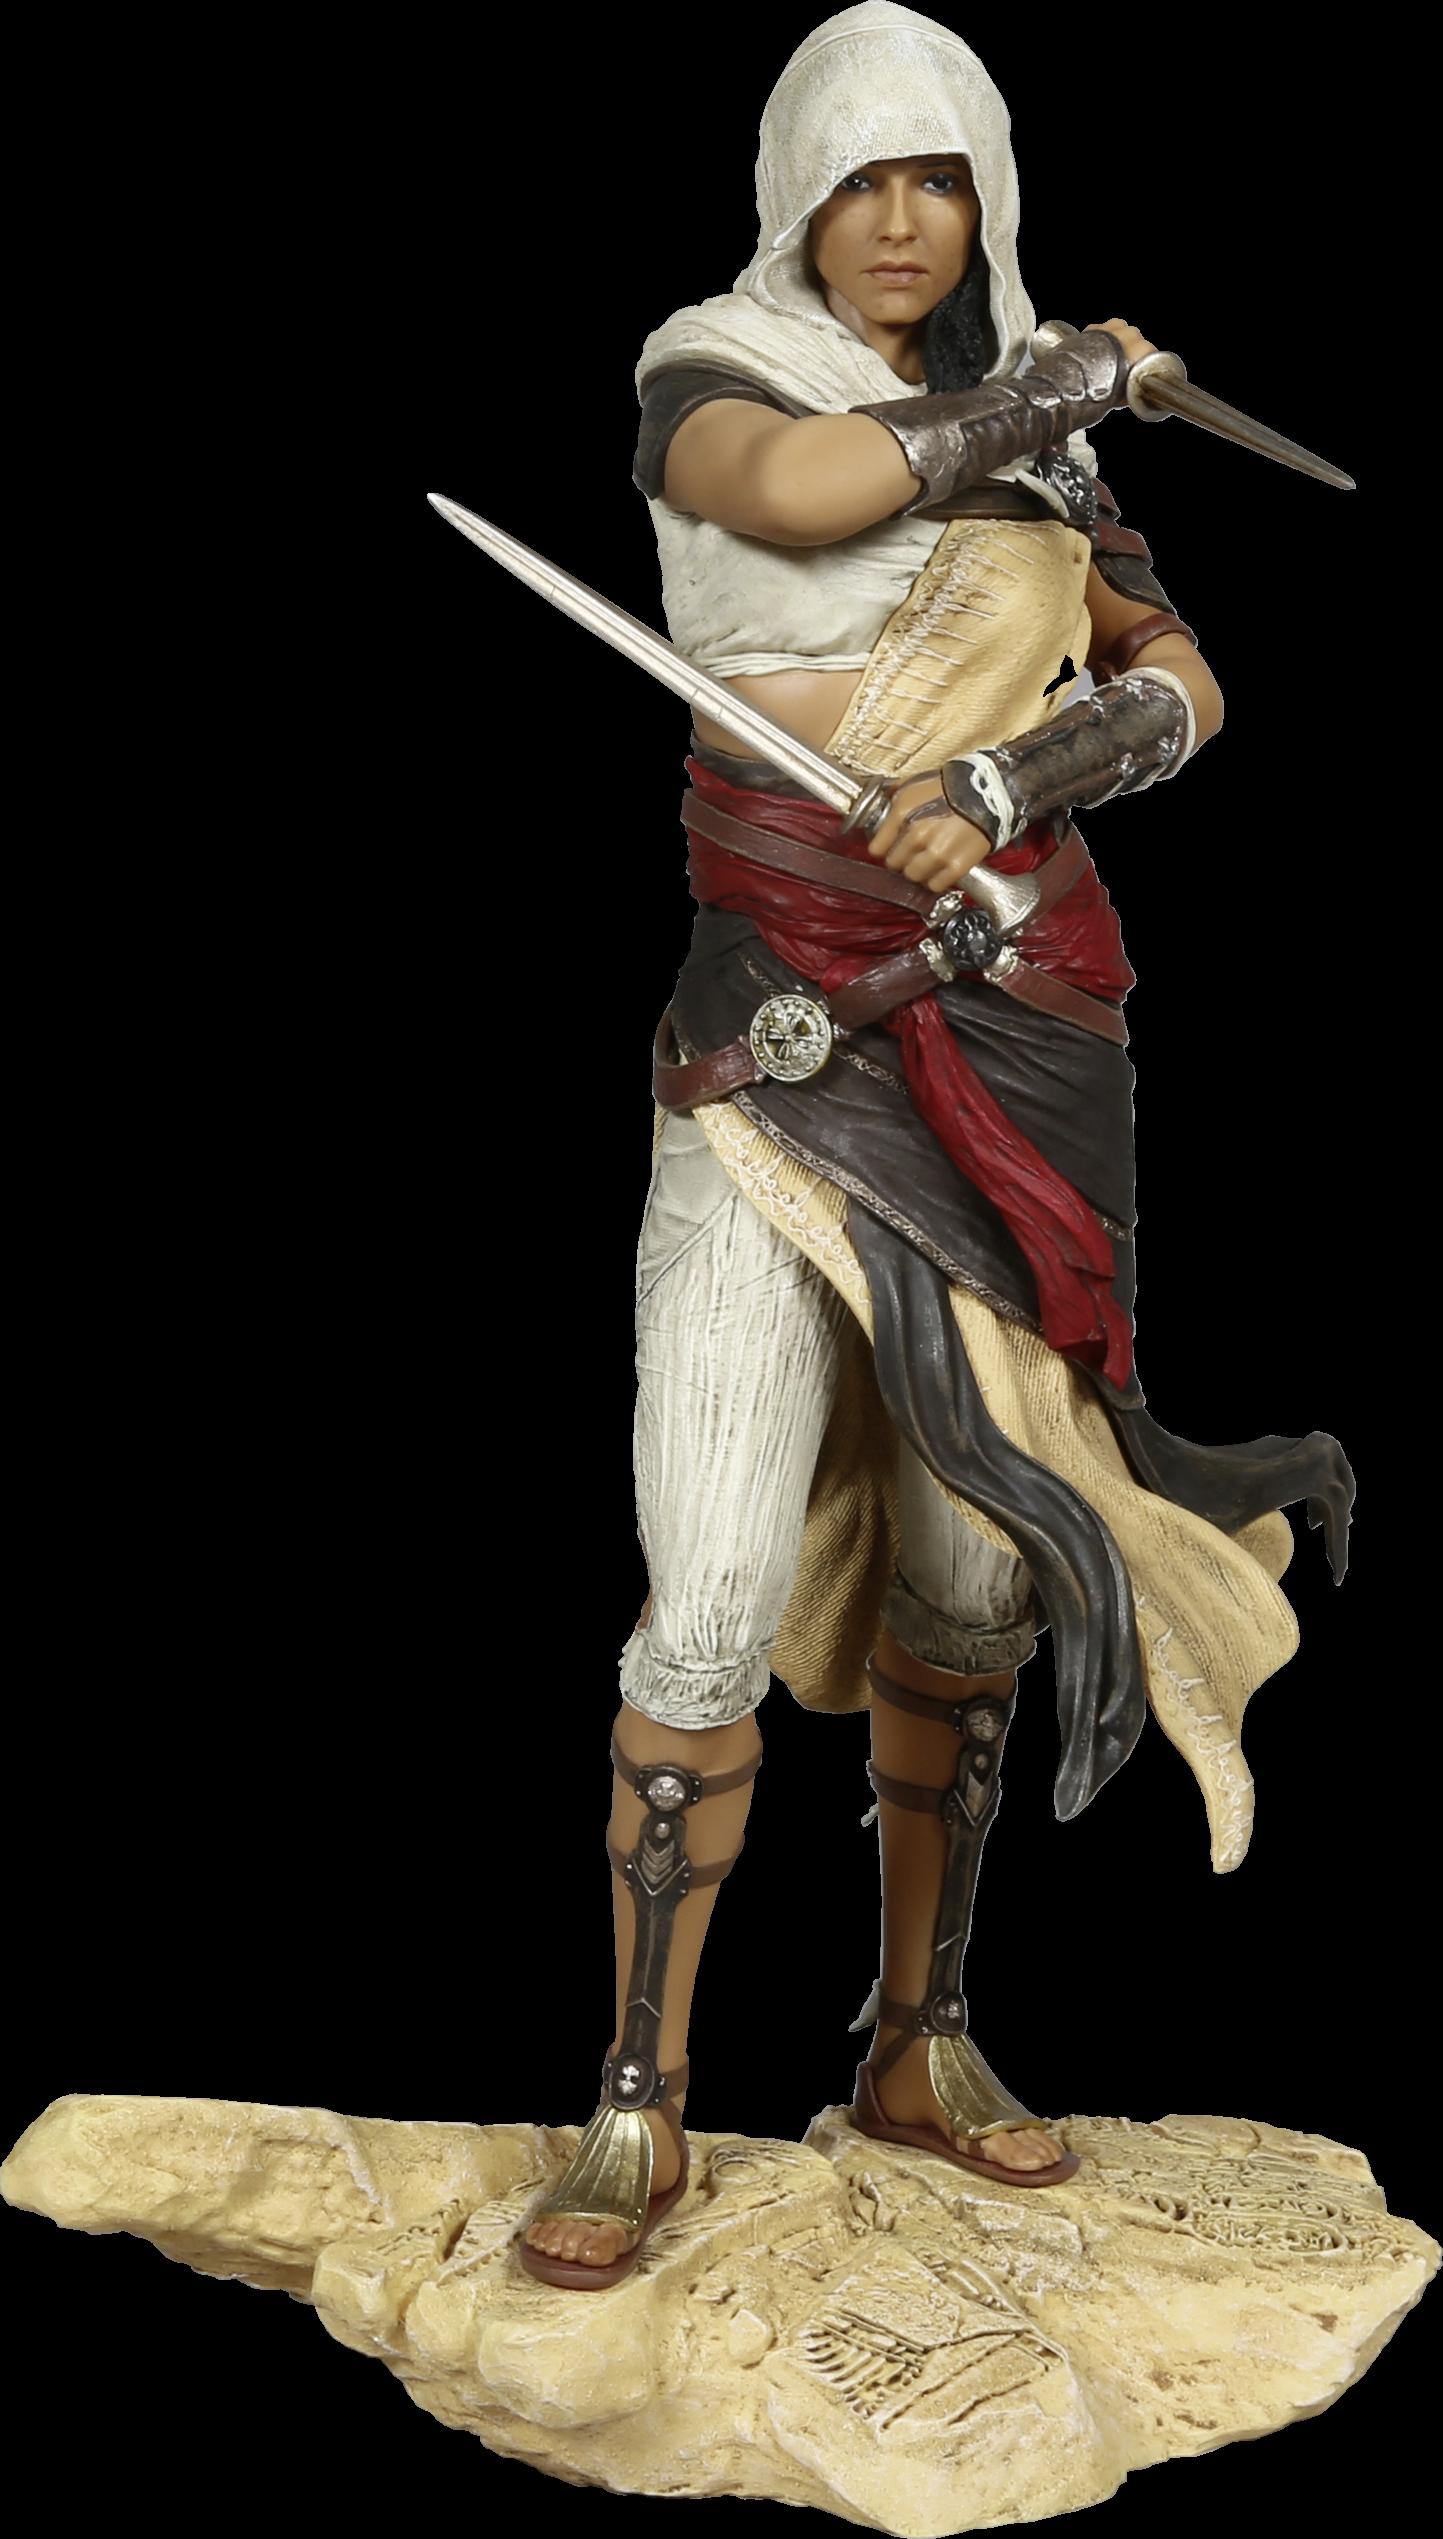 Assassin S Creed Origins Aya Fr Ubisoft Assassins Creed Origins Assassins Creed Assassin S Creed